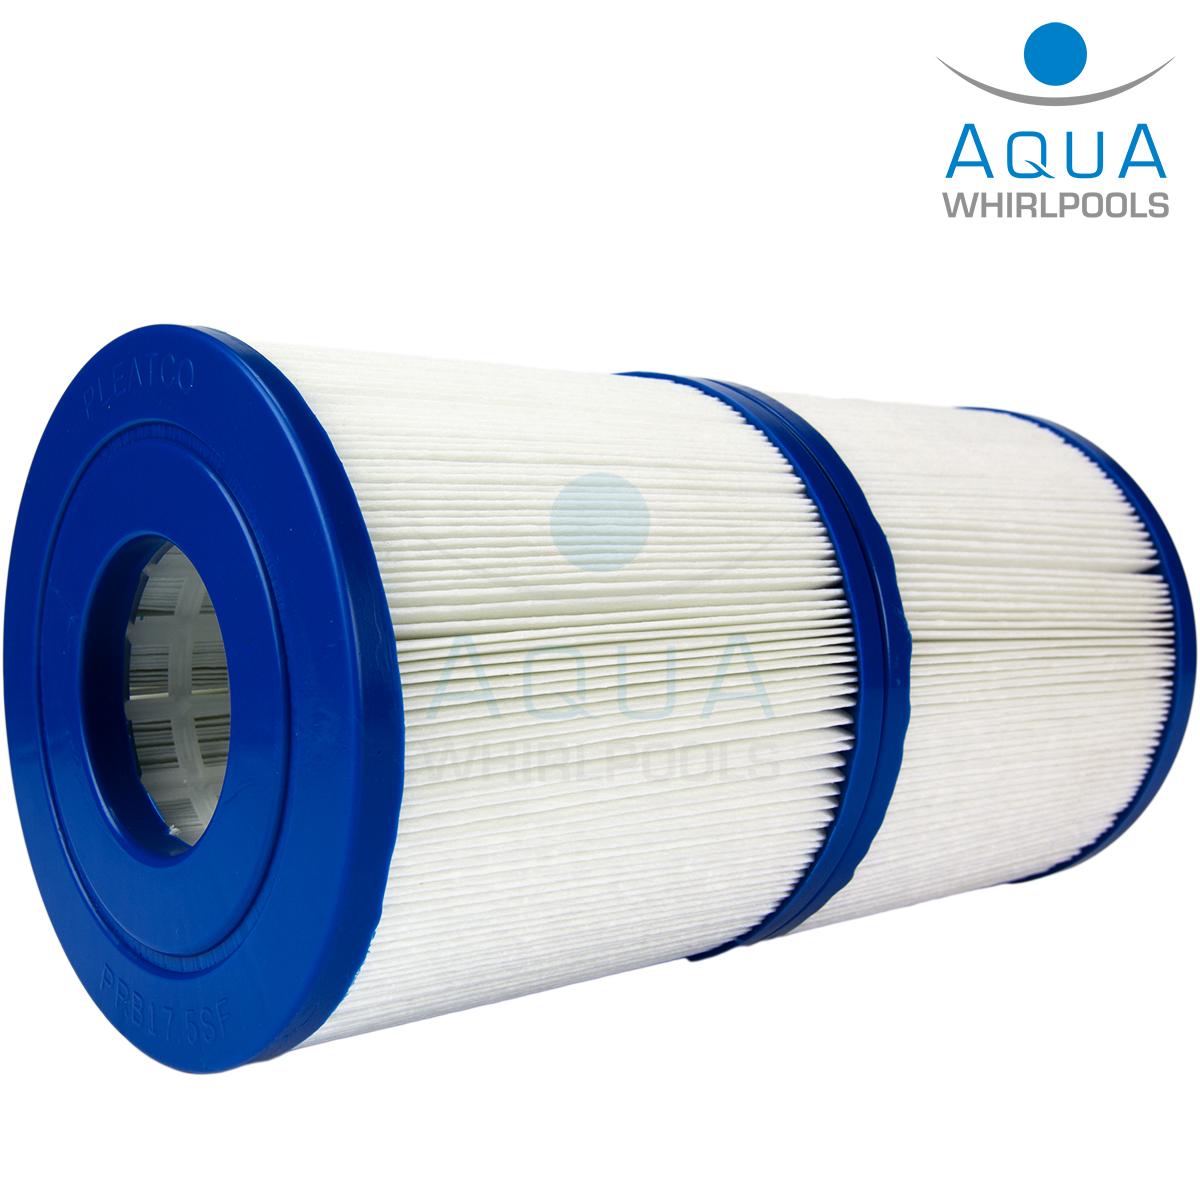 Pdc spas filter nach whirlpool hersteller whirlpool filter aqua whirlpools - Aqua whirlpools ...